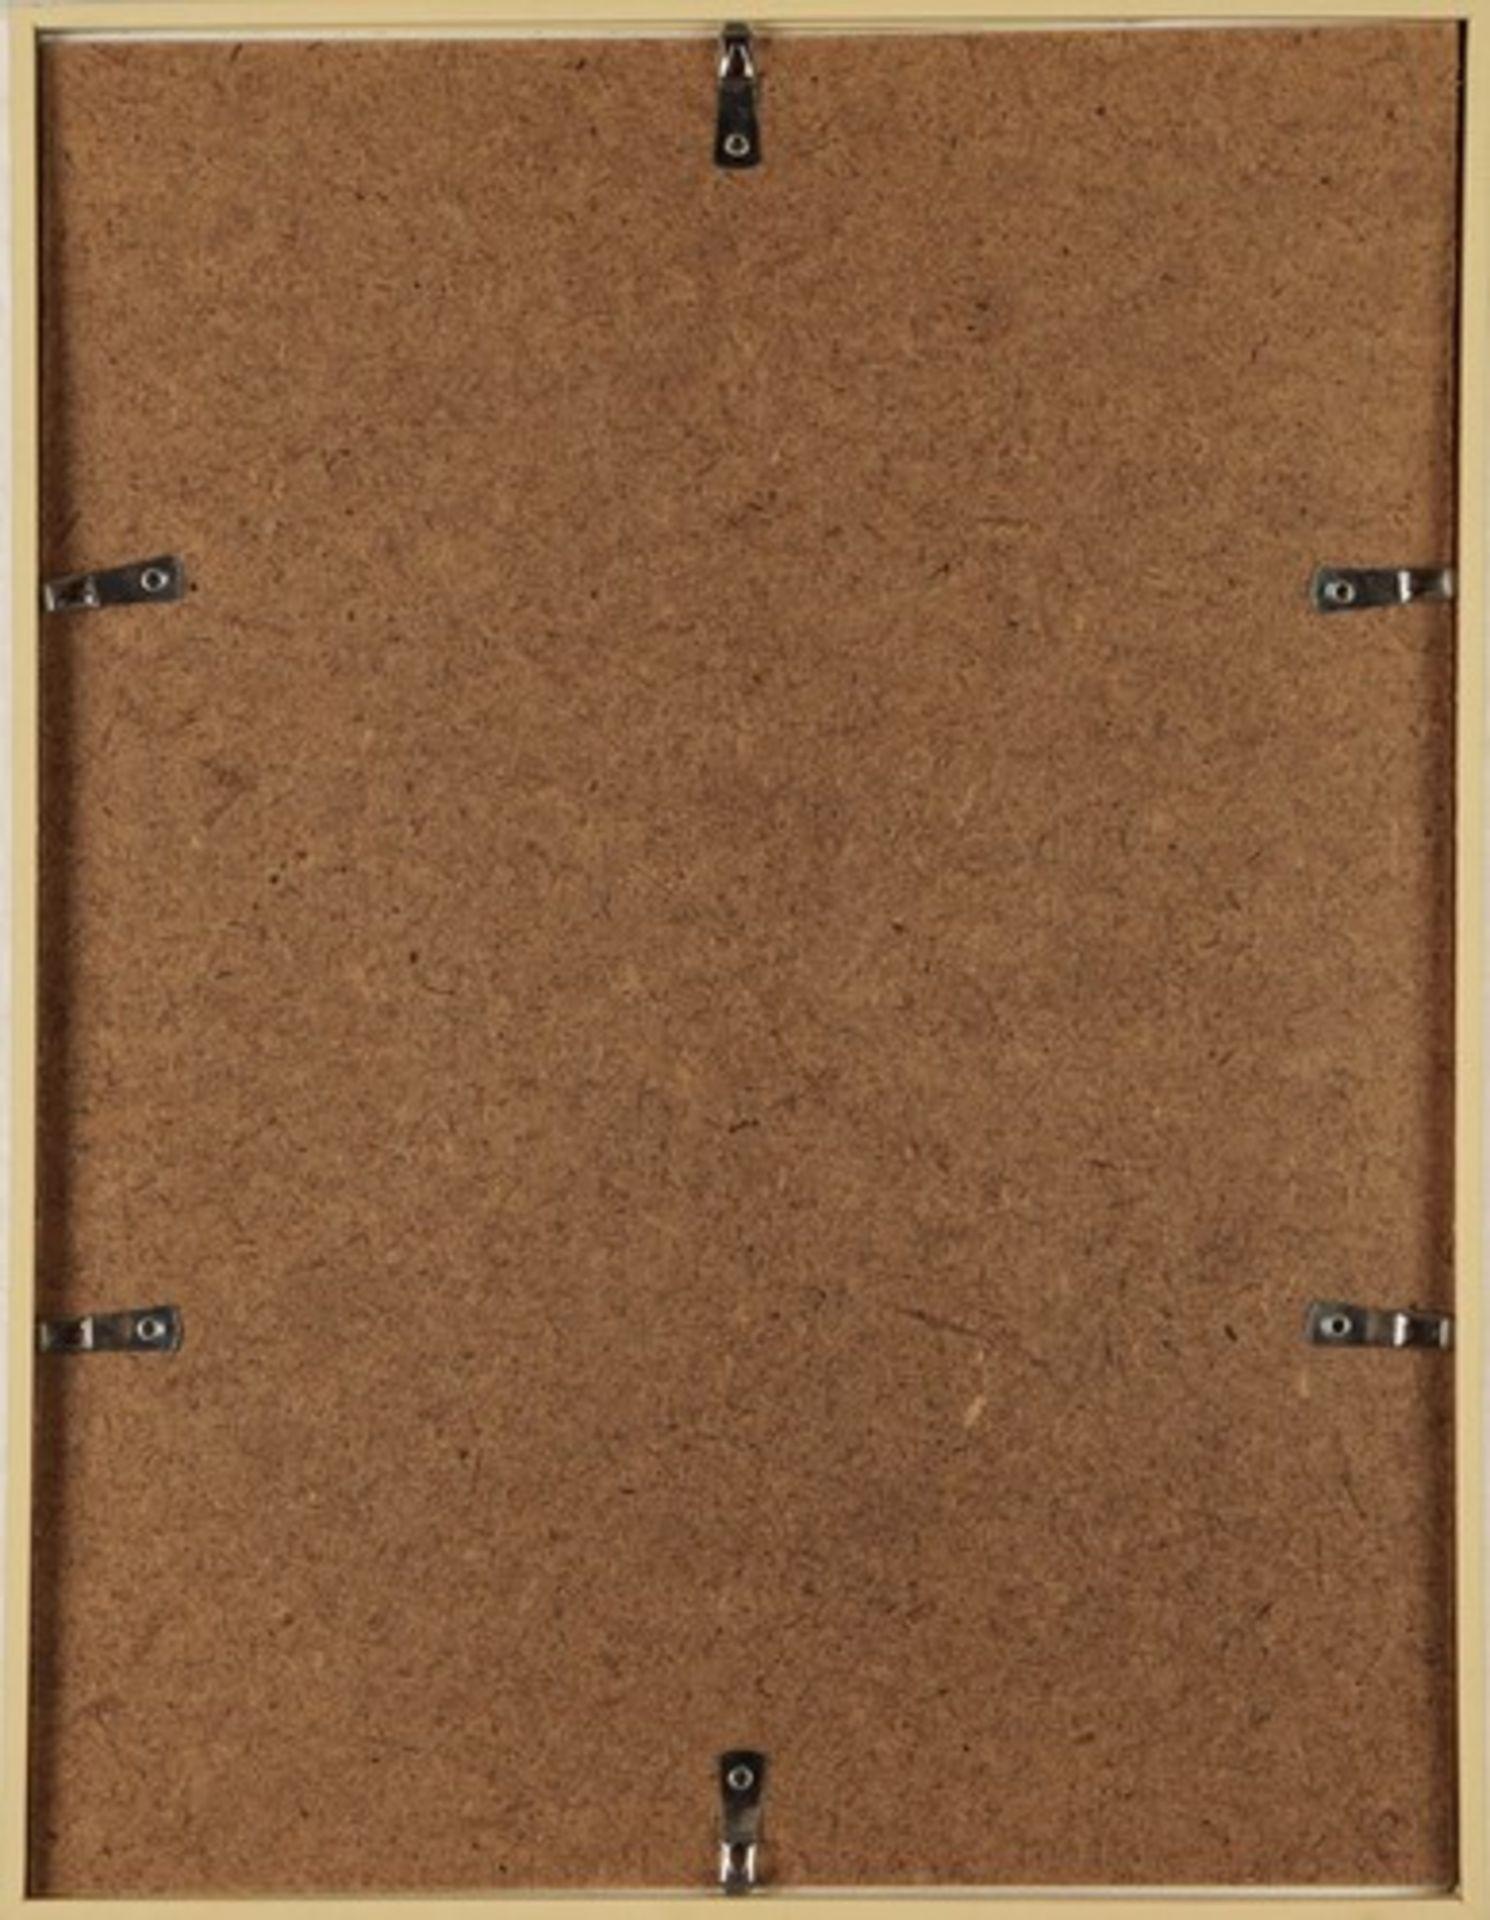 Los 1822 - Bild - ErotikaA. 20.Jh., Indien, Mischtechnik/Papier, erotische Darstellung im Palastinterieur,